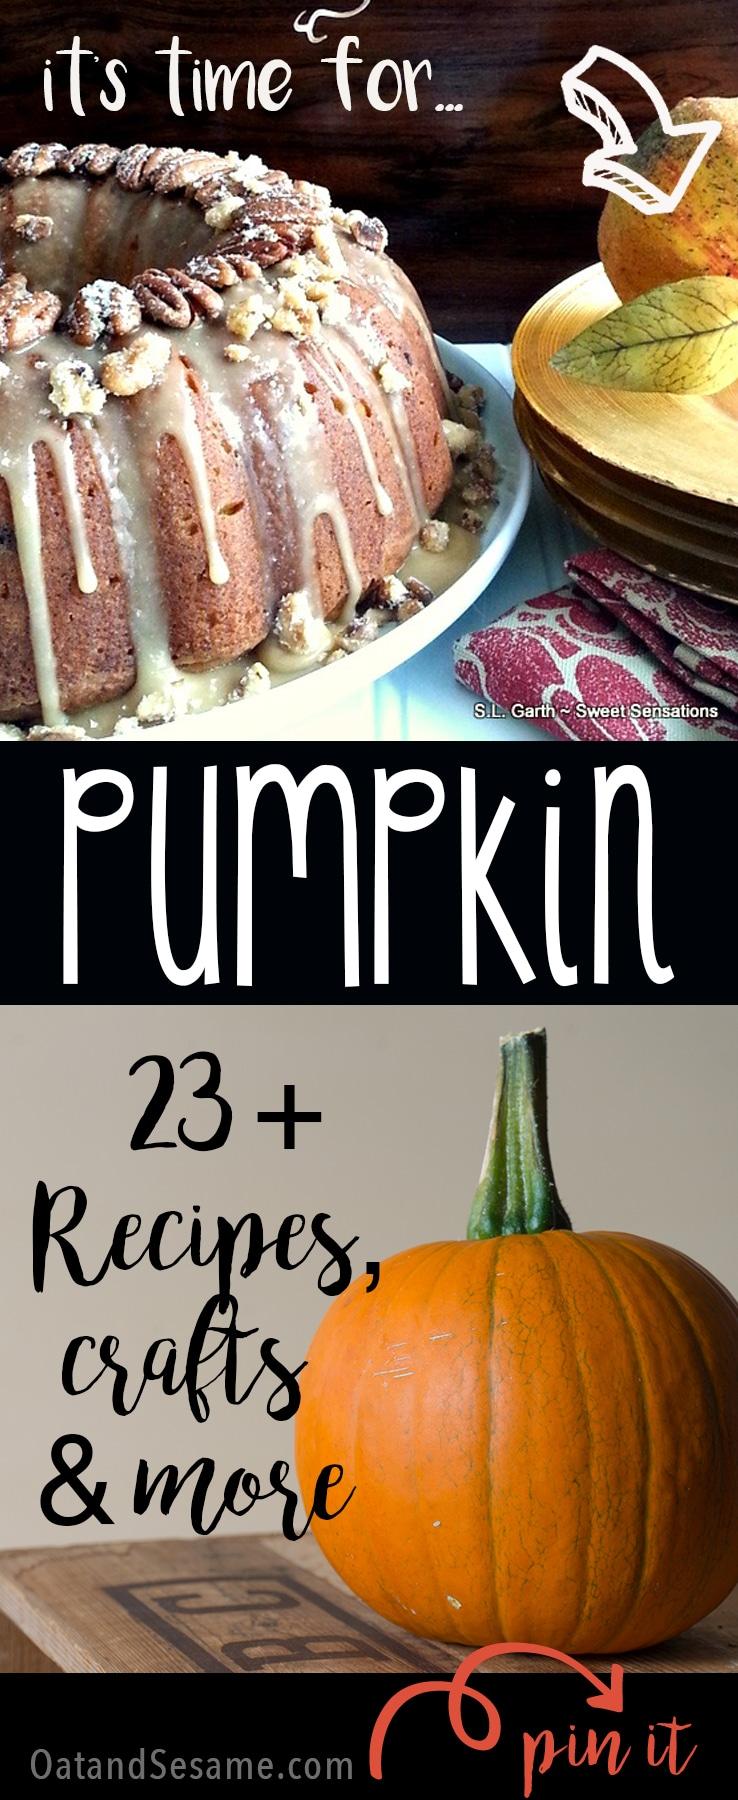 23 + Awesome Pumpkin Recipes, Crafts & More! Celebrate #Fall   Recipe at OatandSesame.com